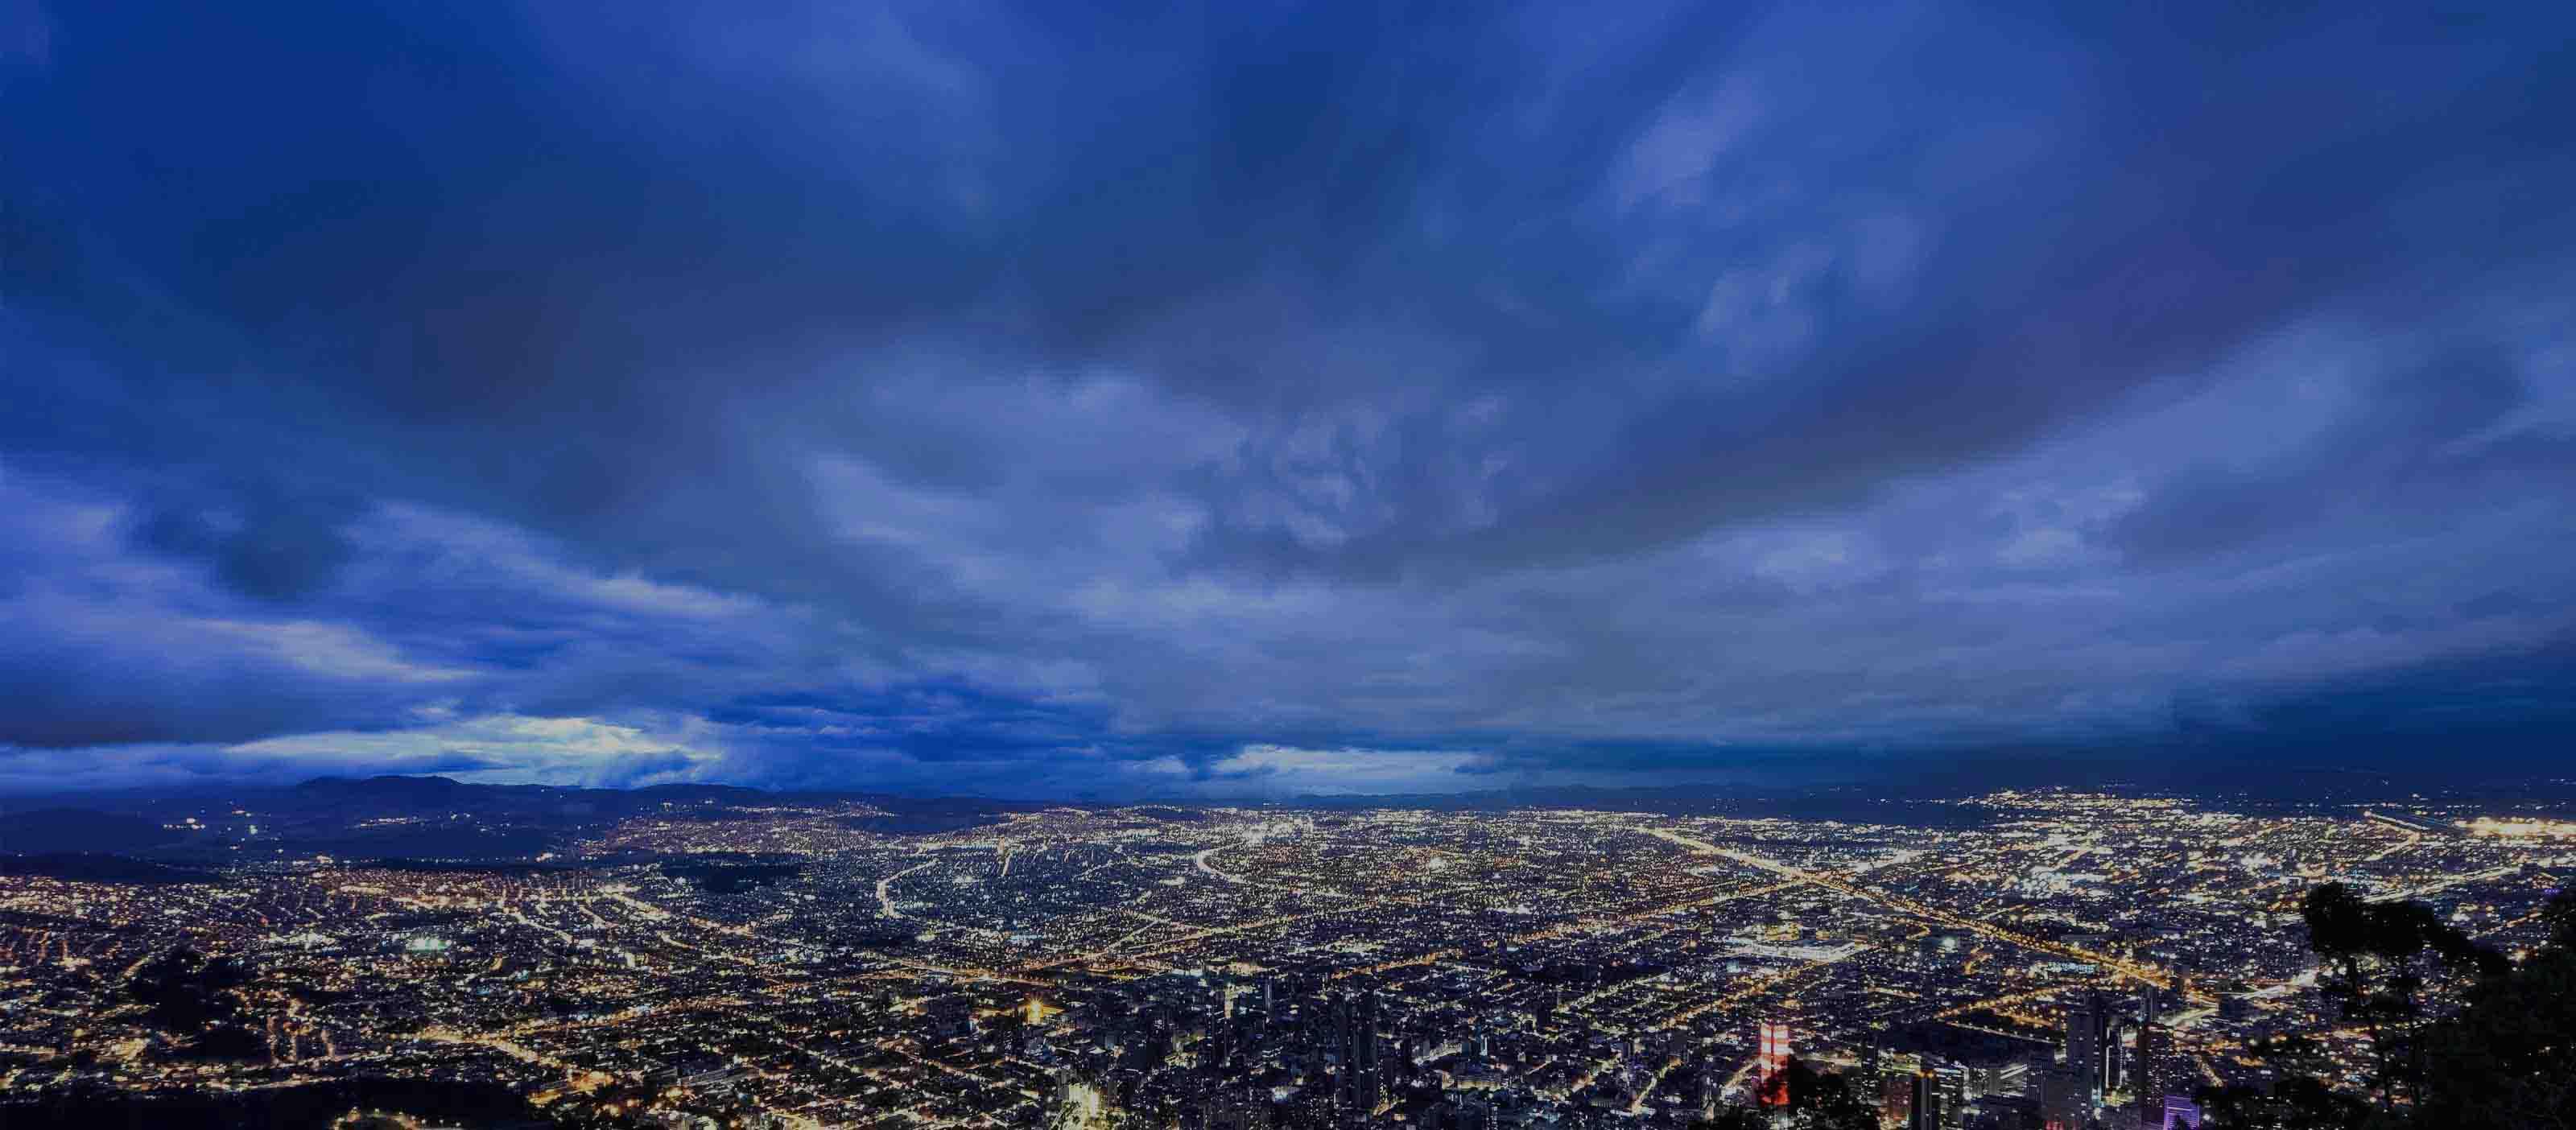 Keeping the electric grid operational |GE Digital